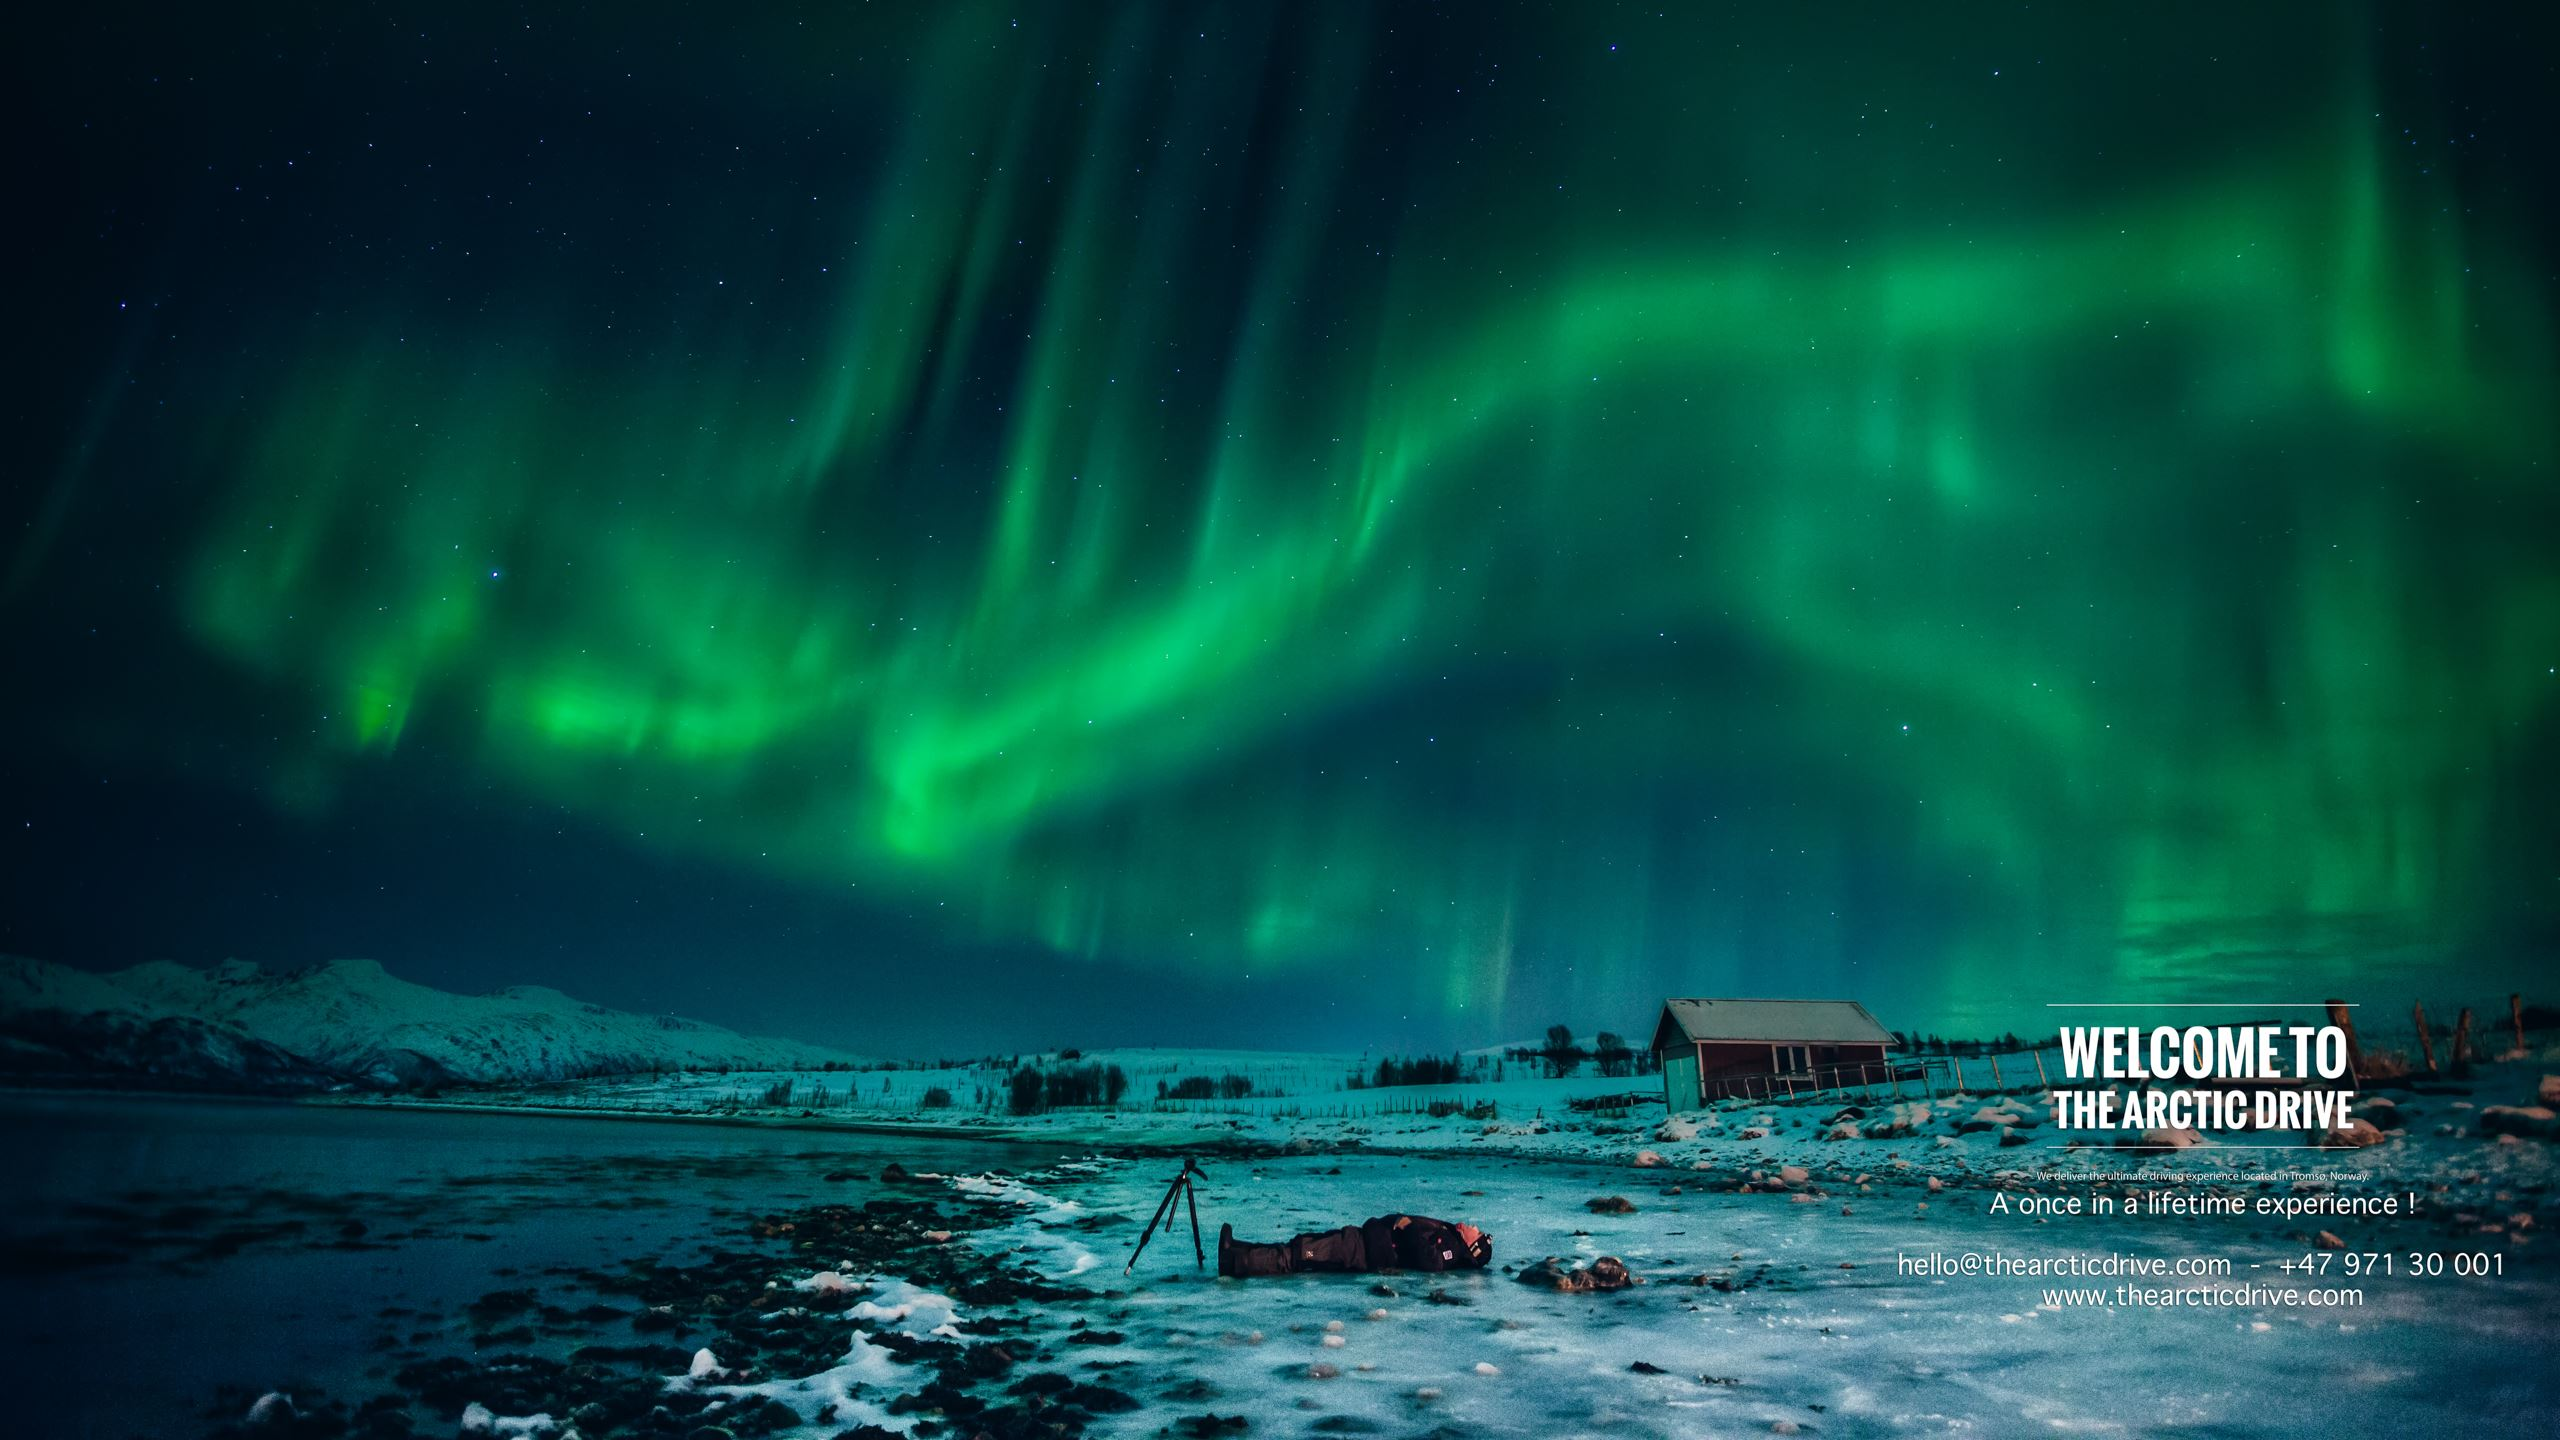 Luxury Minibus Northern Light tour - The Arctic Drive